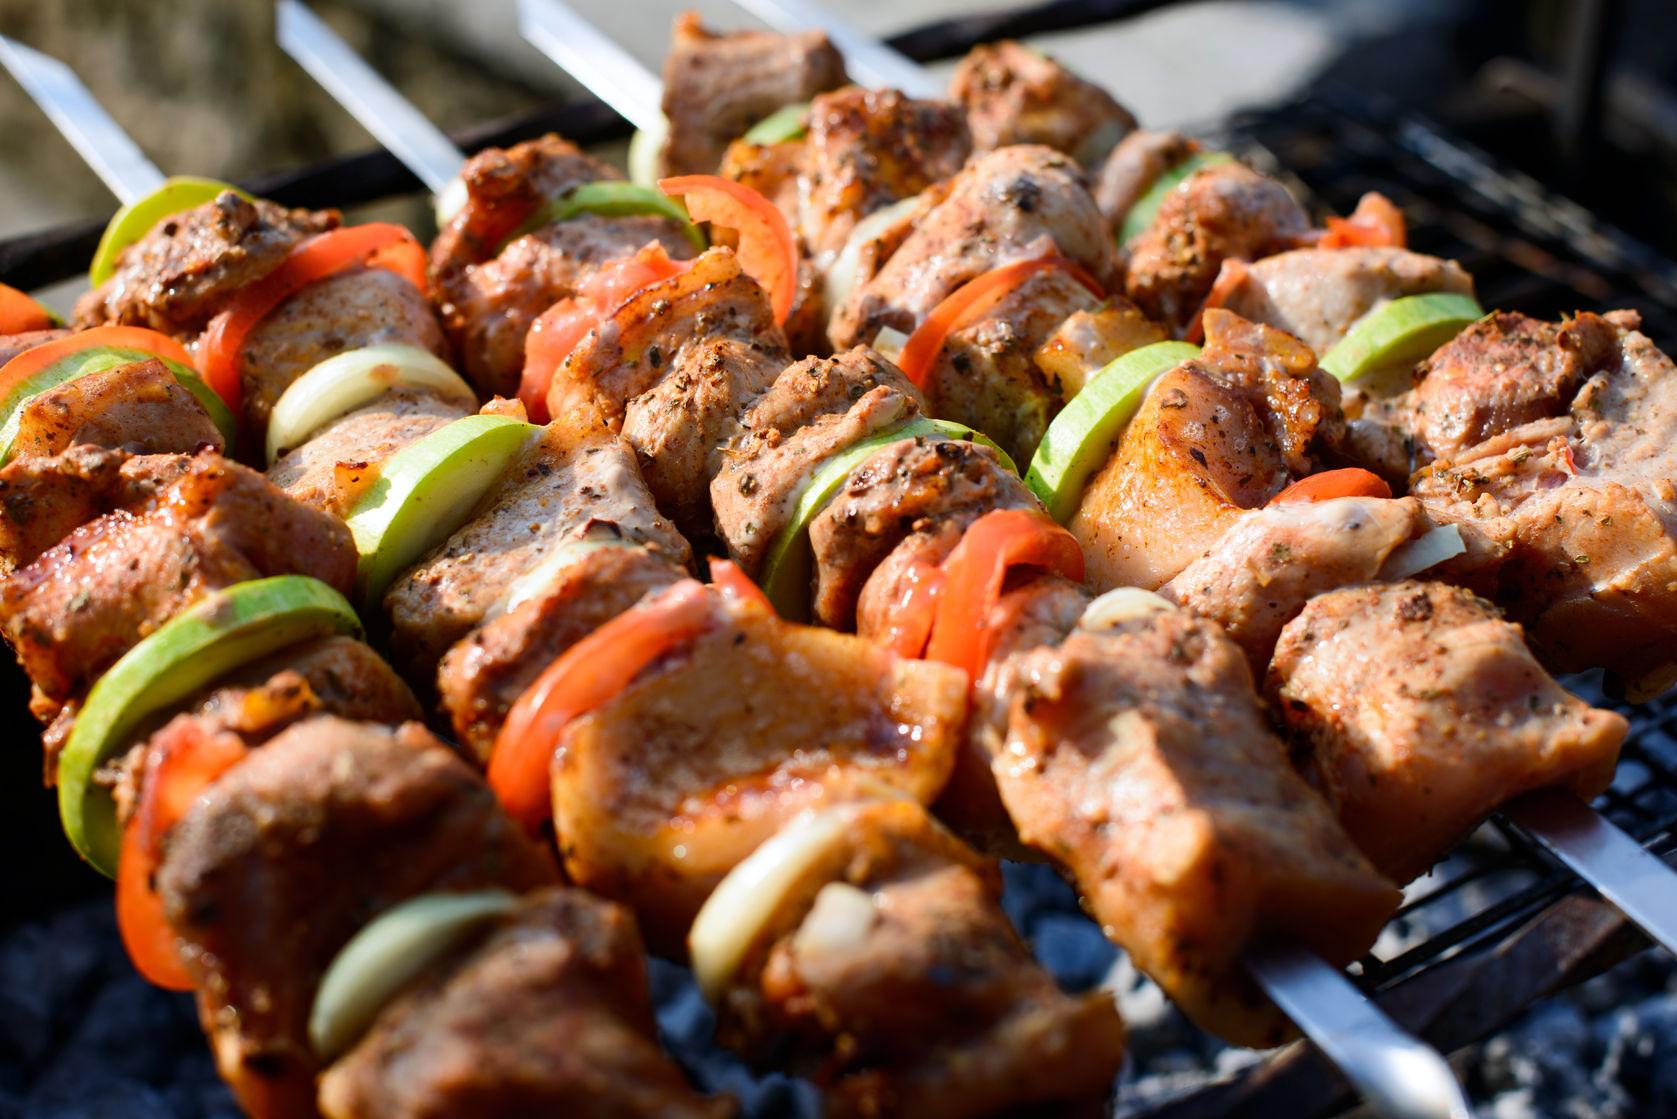 Barbecue - Slagerij Louman